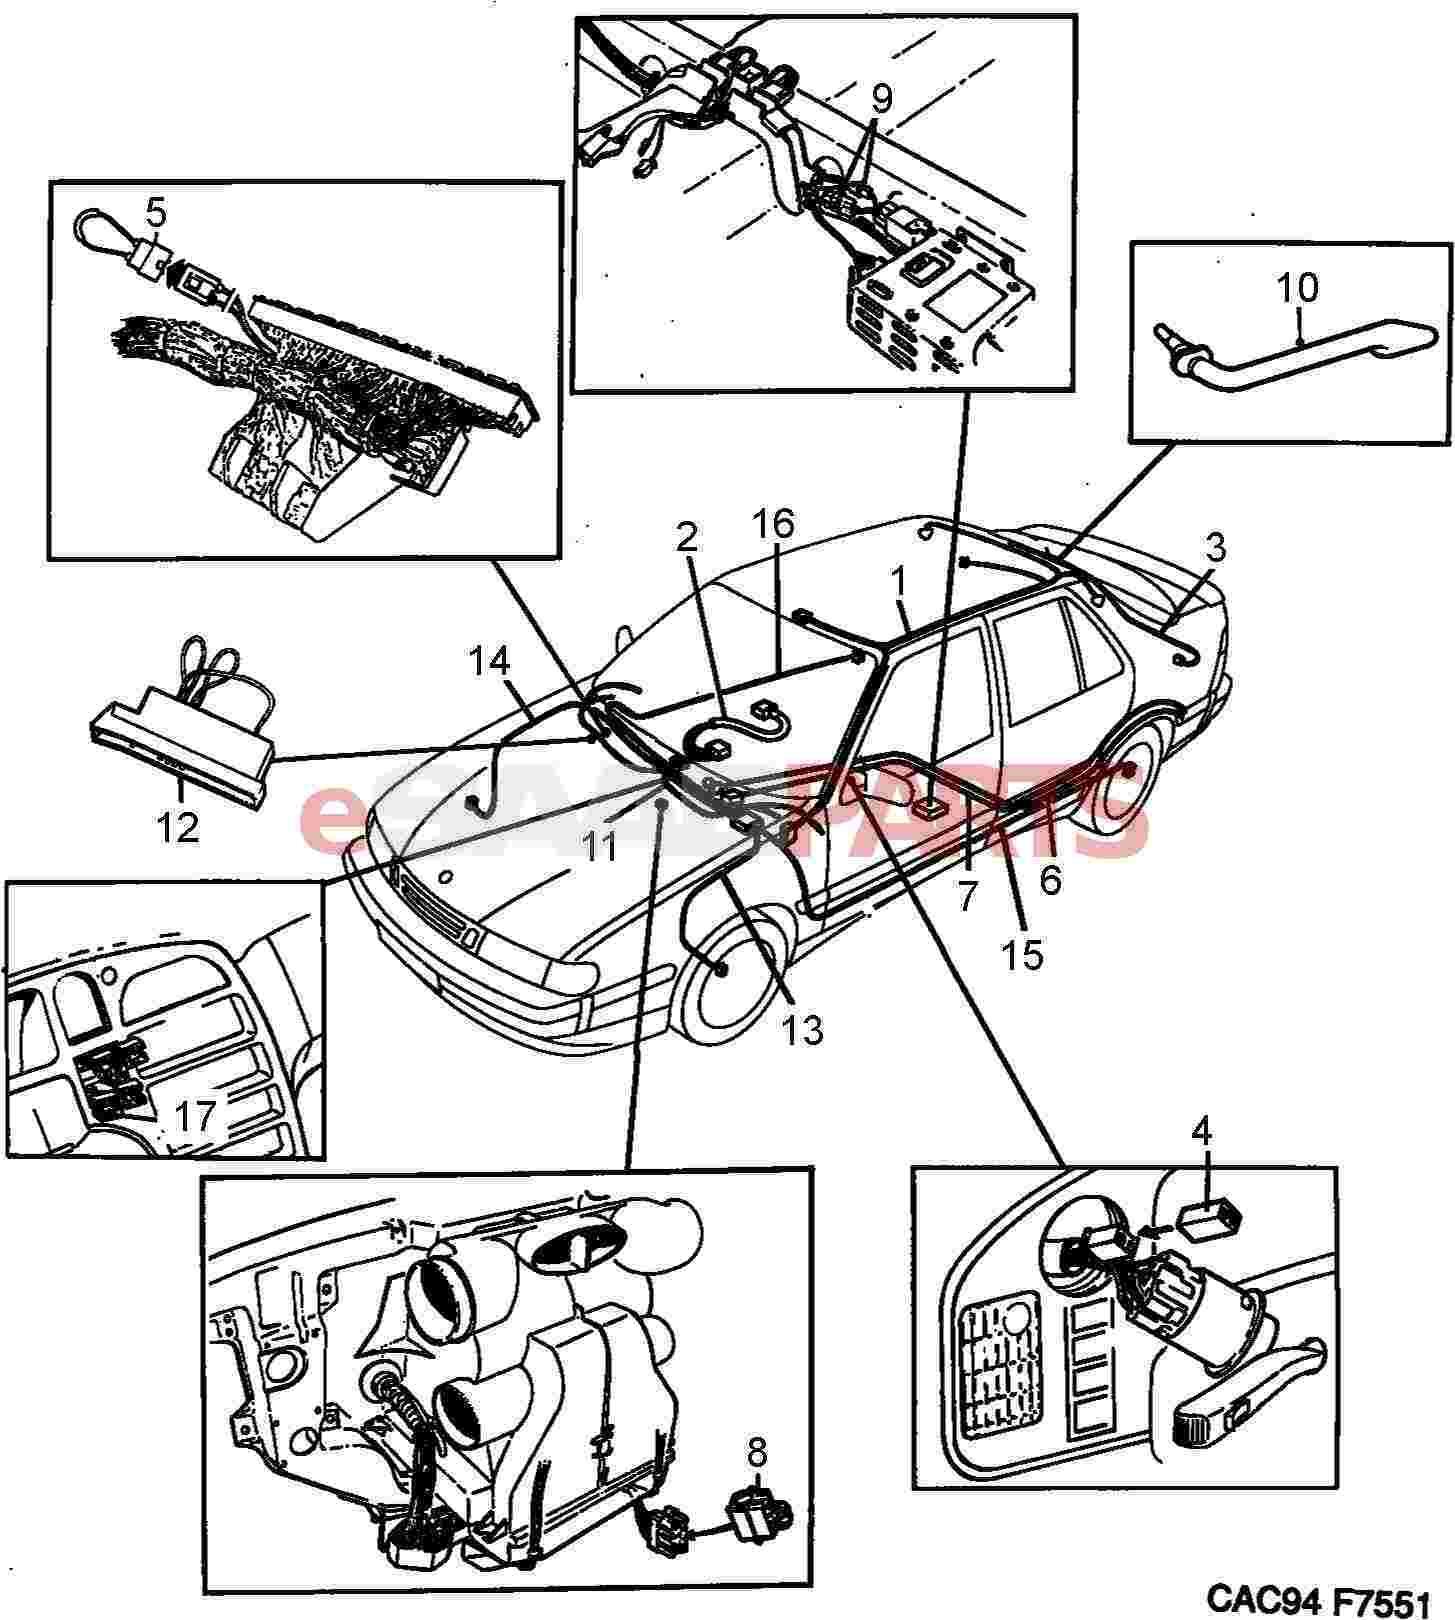 [DIAGRAM] Wiring Diagram For Saab 9000 FULL Version HD